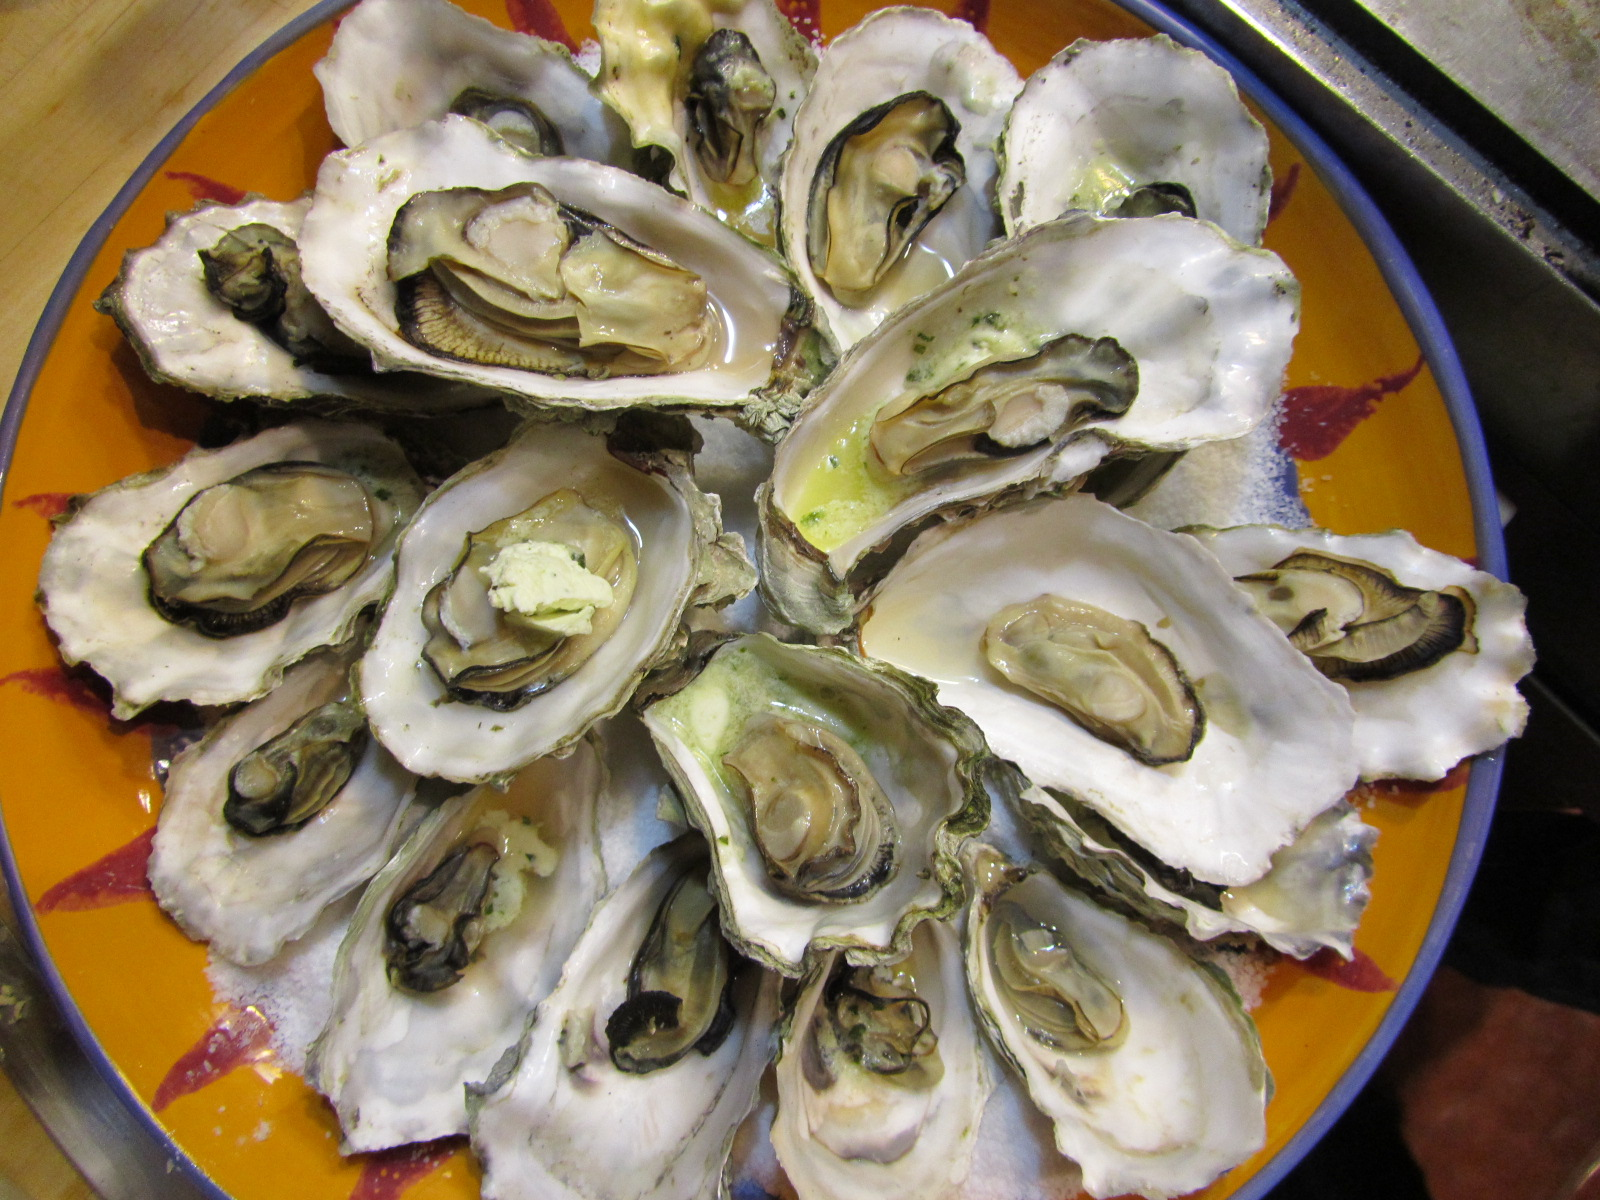 ... and oysters baked egg baked ziti baked brie baked ziti i baked